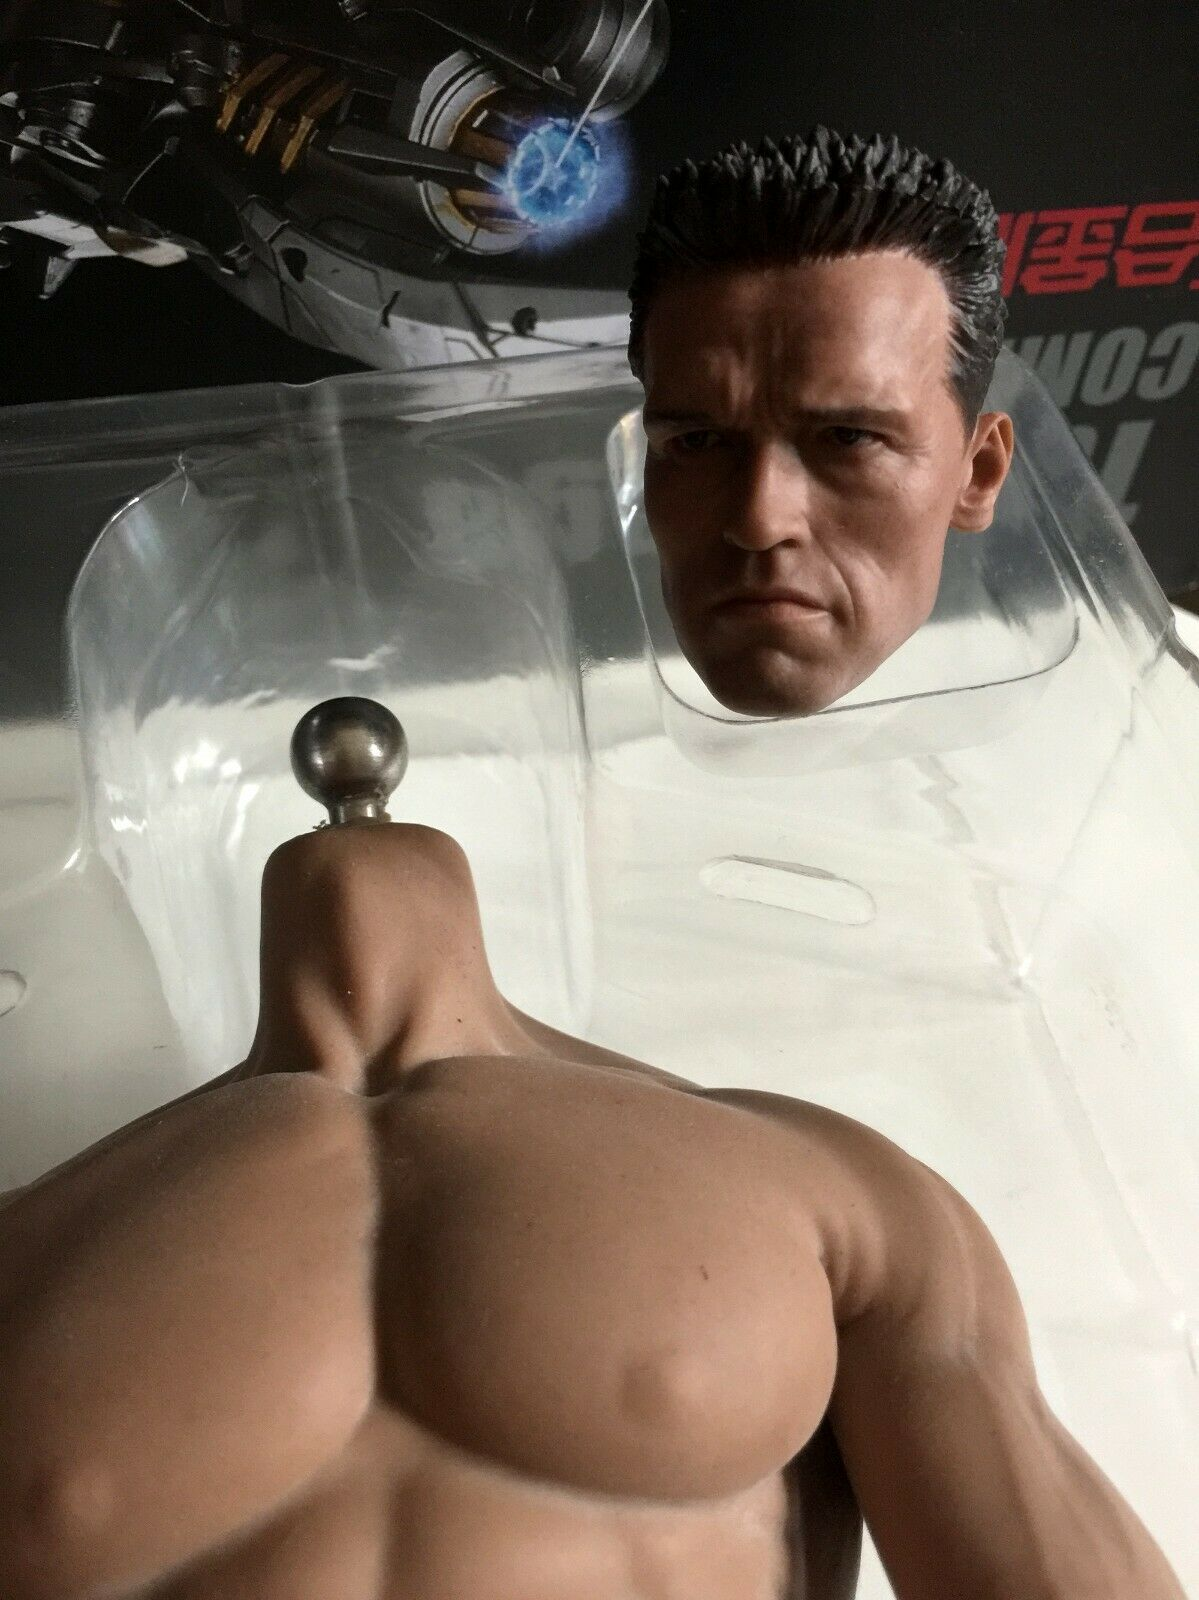 1 6 PHICEN Male Body Body Body M34 Seamless Muscular Arnold blackenegger Head Sculpt Toy 785015